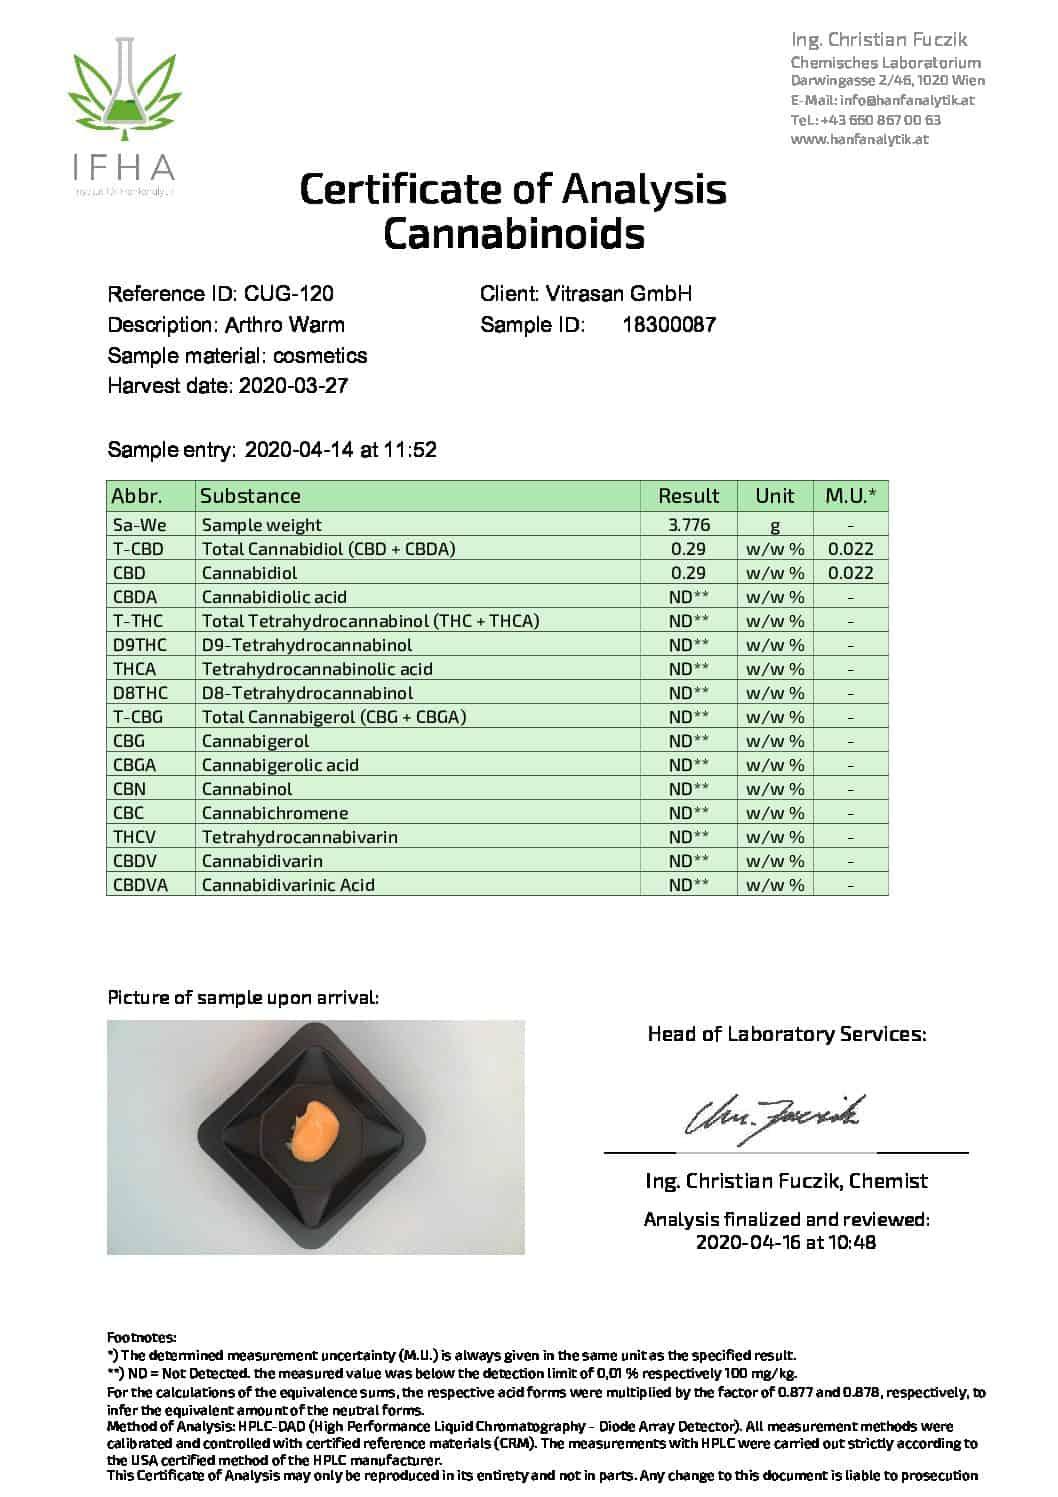 cbd магазин - biokosmetik analysenzertifikat arthro warm 03 2020 pdf